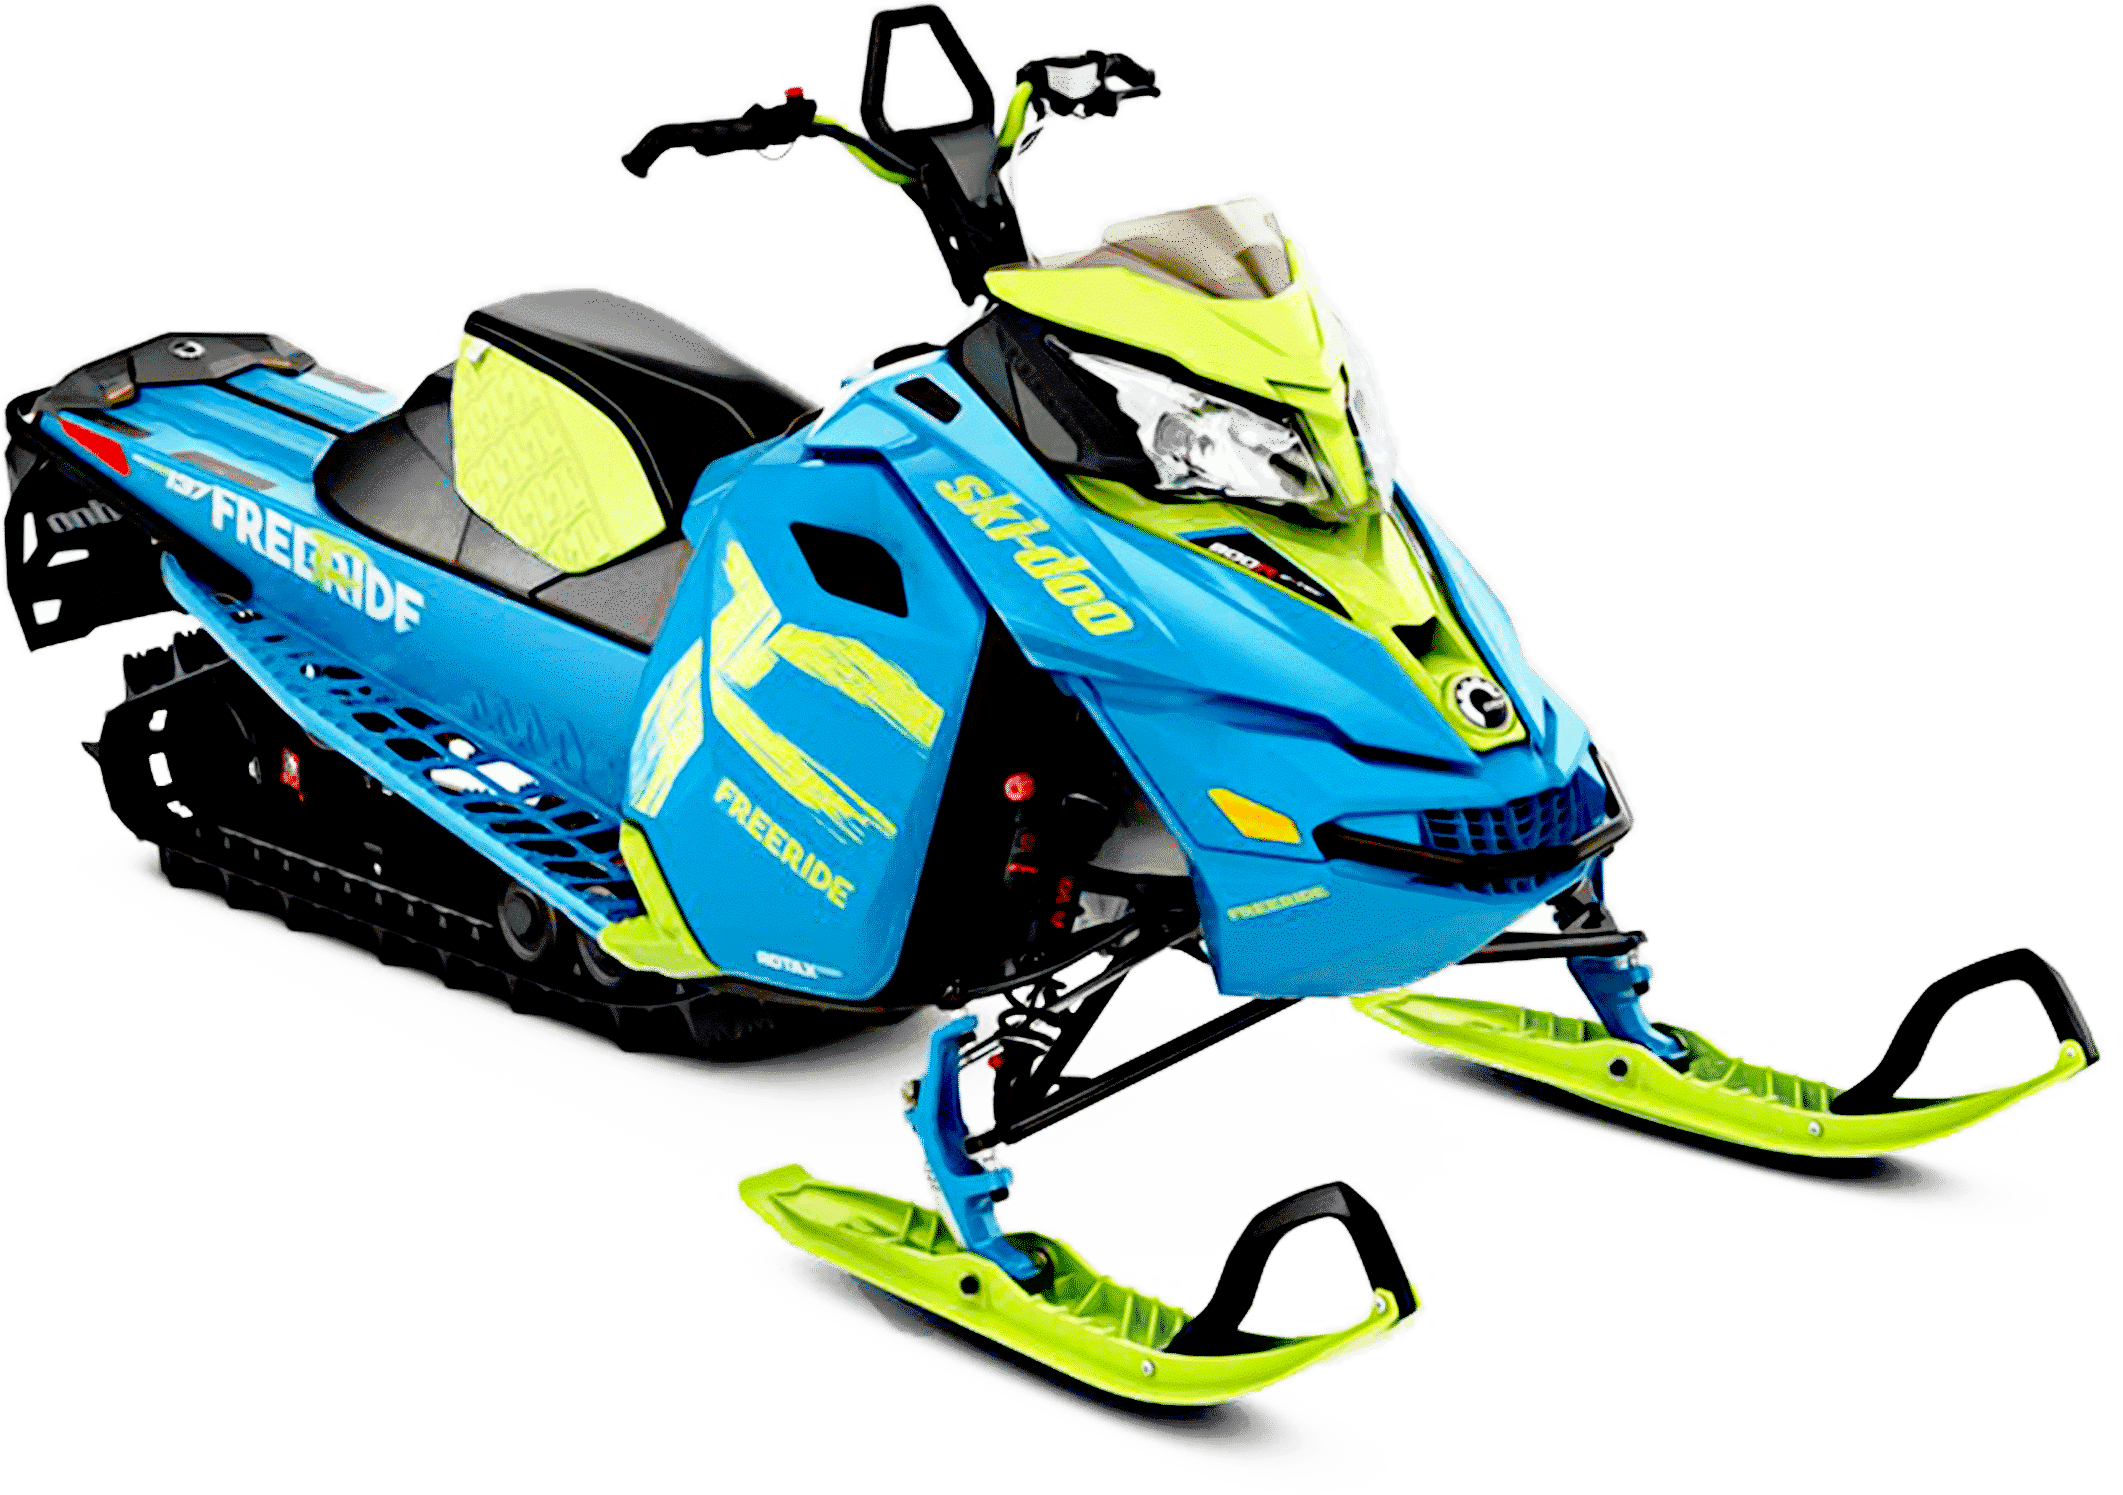 Ski-Doo Freeride 4